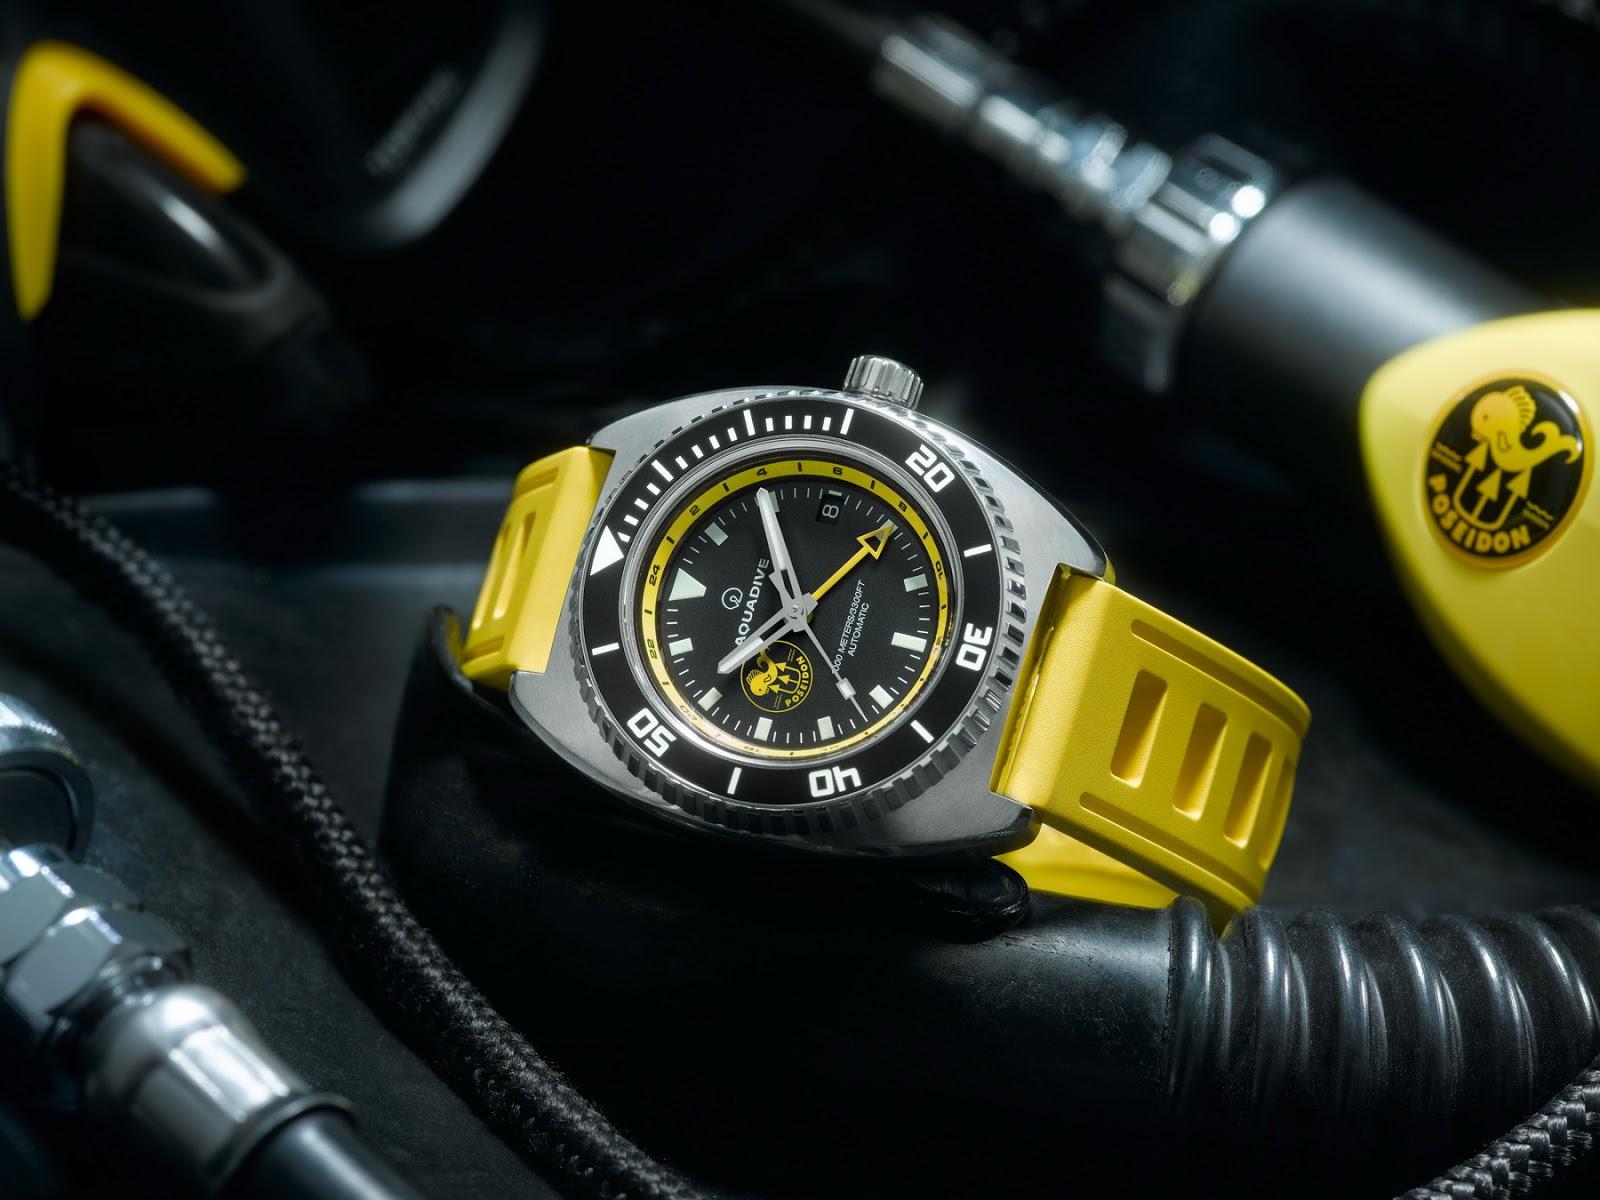 Aquadive's new Poseidon GMT AQUADIVE+Bathyscaphe+100+GMT+POSEIDON+08